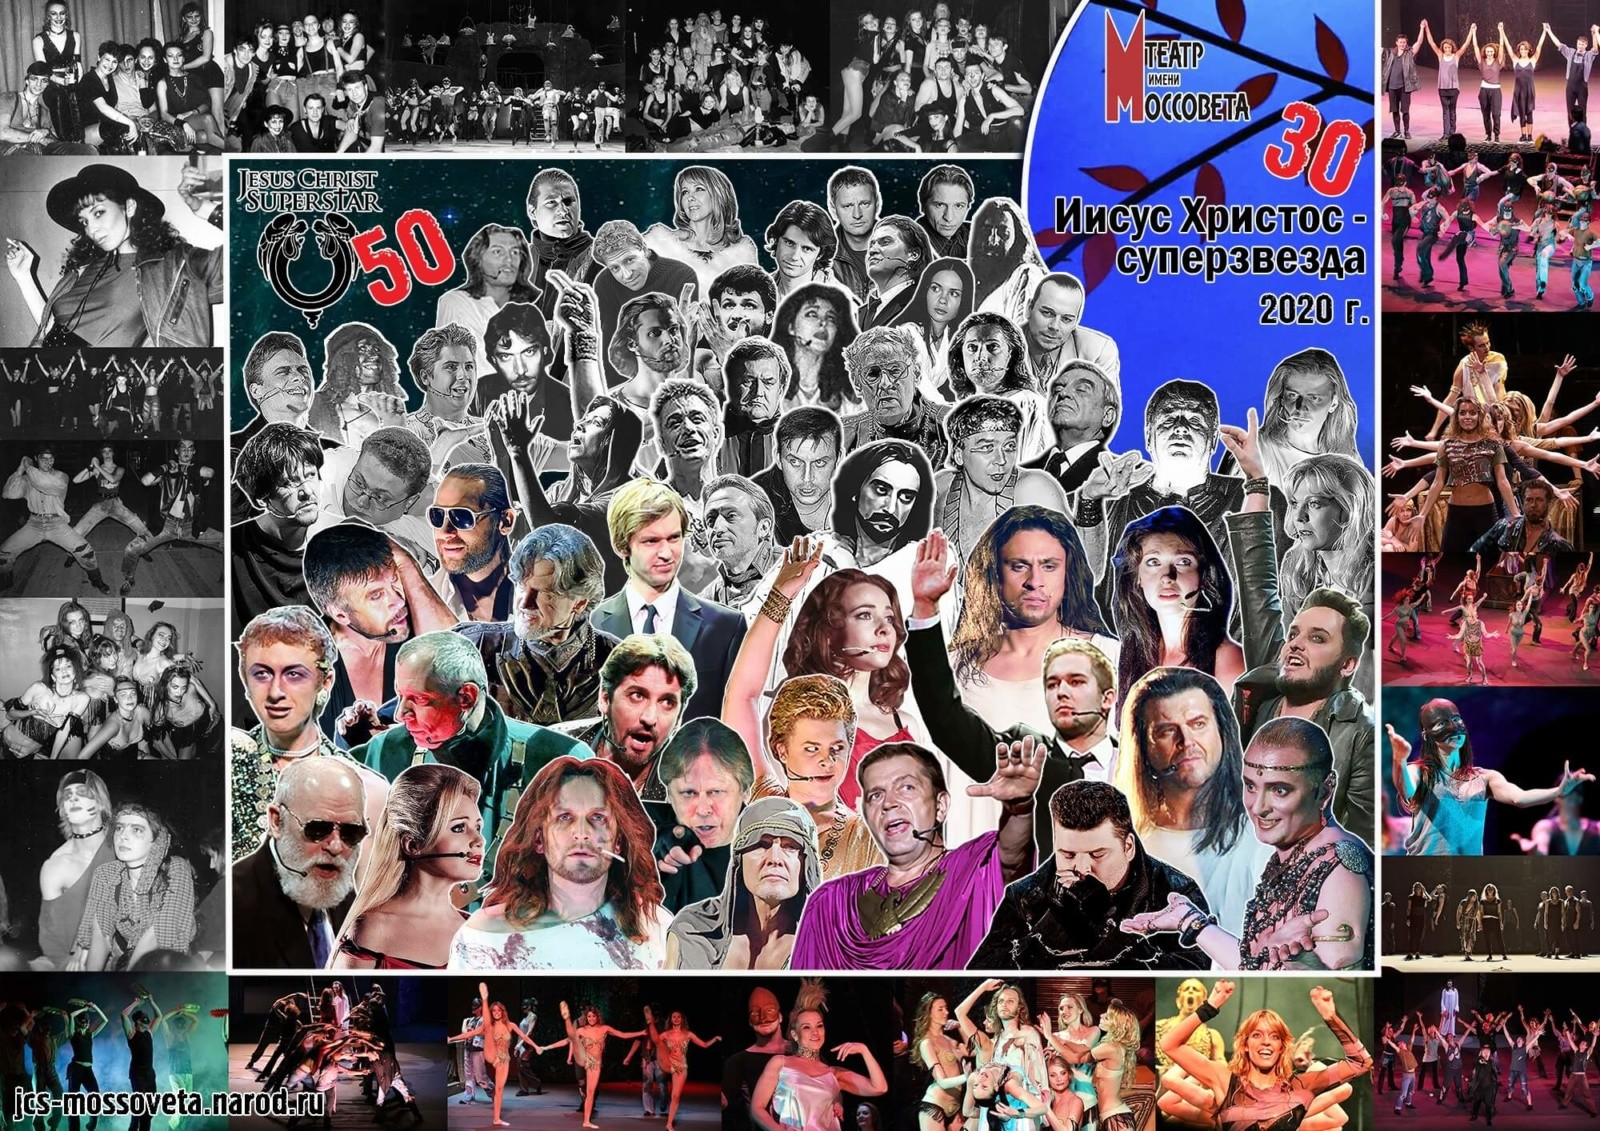 24 октября 2020 года, Театр им. Моссовета, «Иисус Христос — суперзвезда», 30 лет на сцене